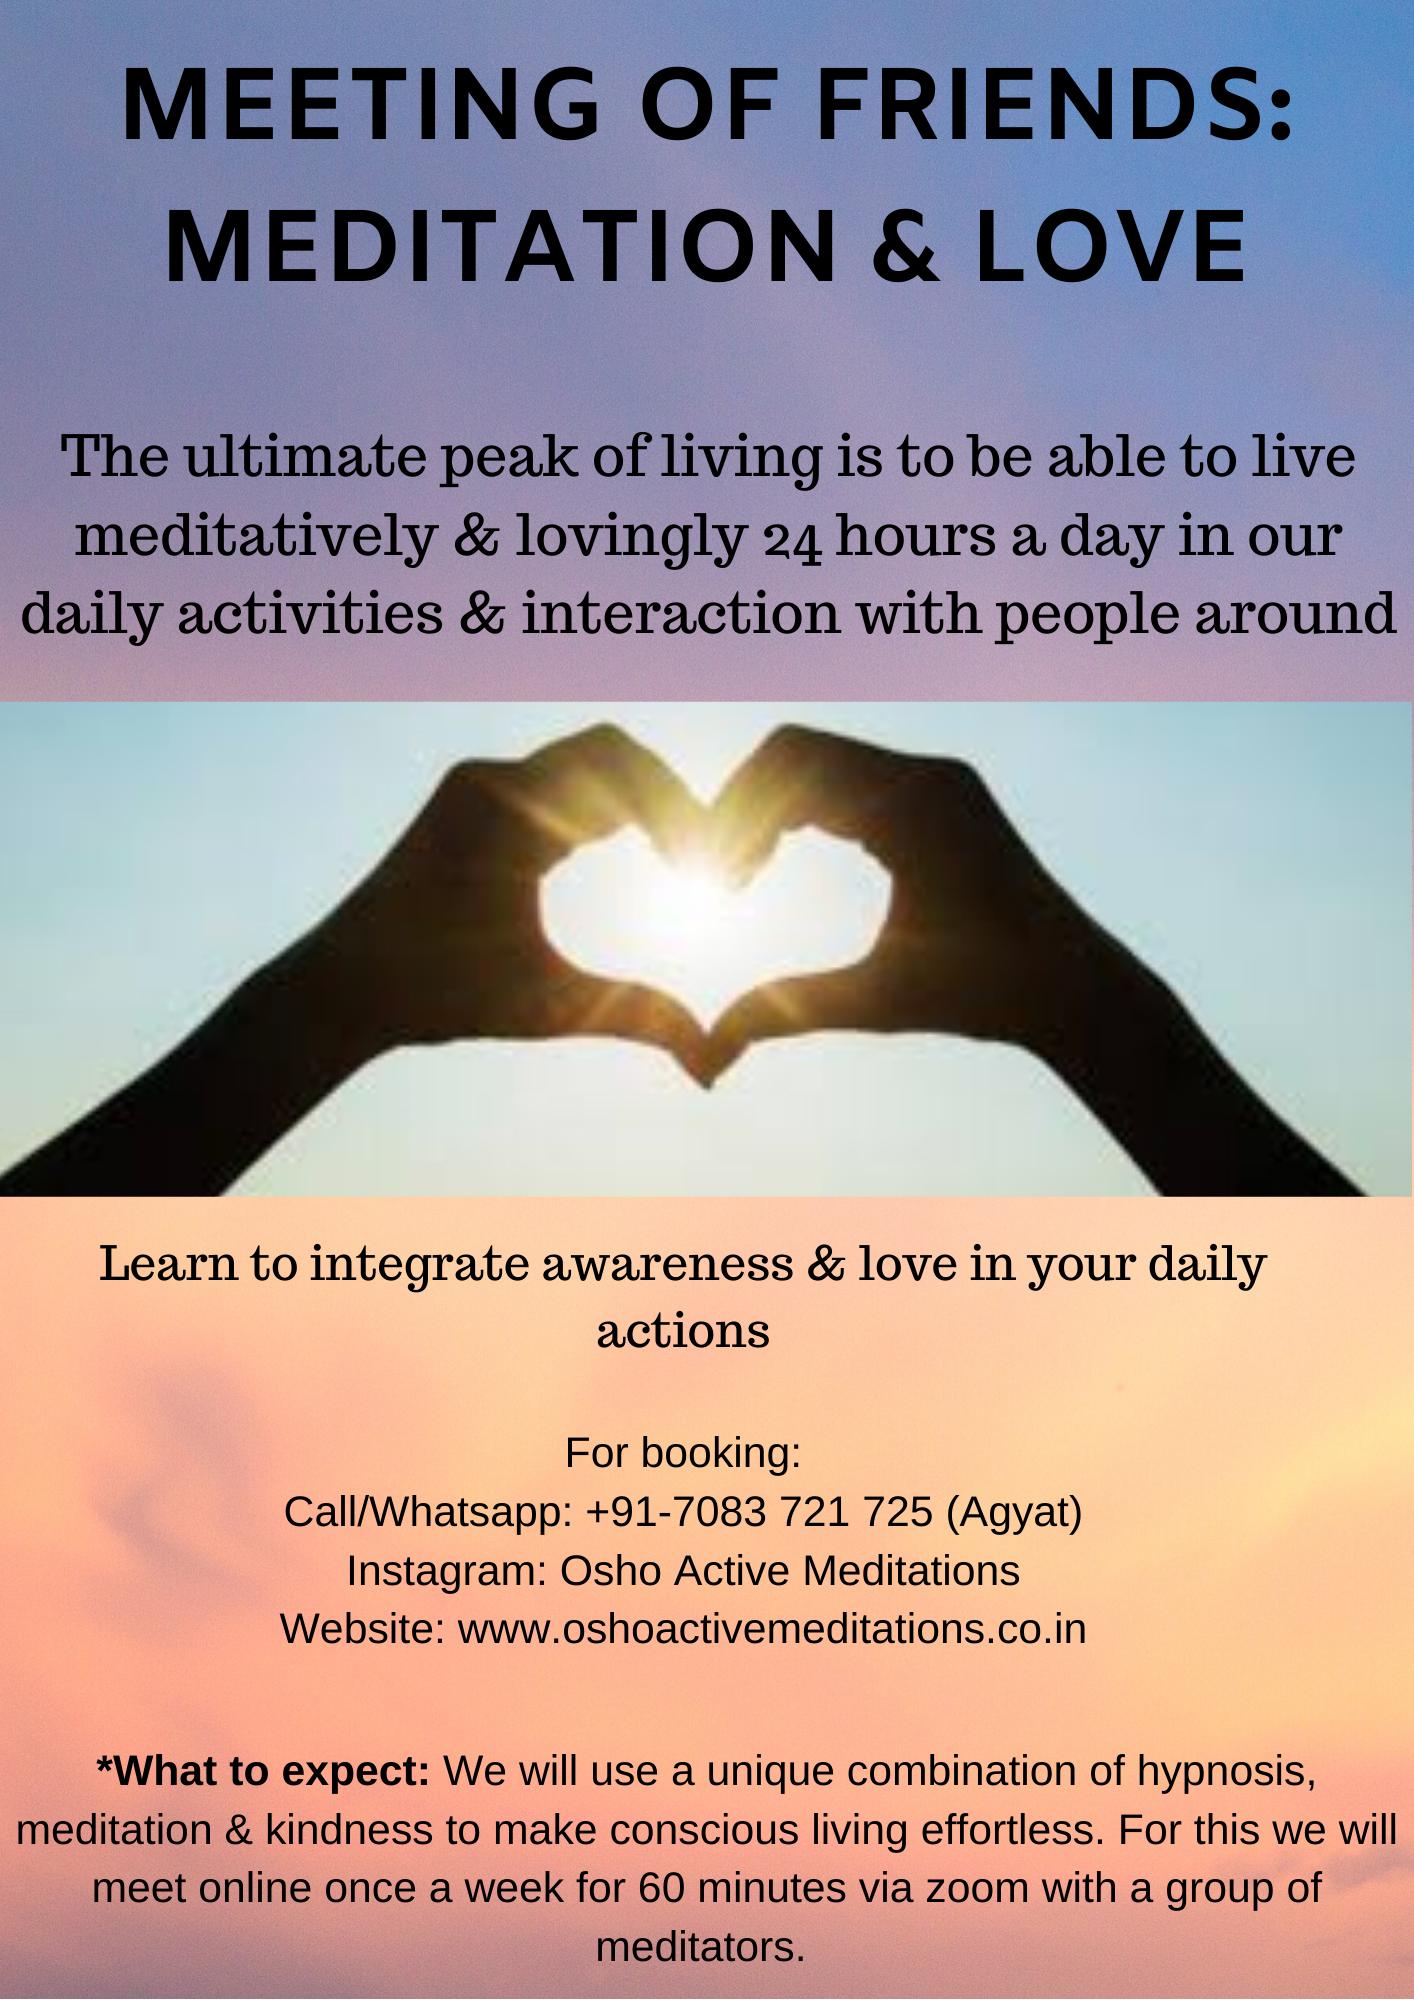 Meeting of Friends - Meditation & Love